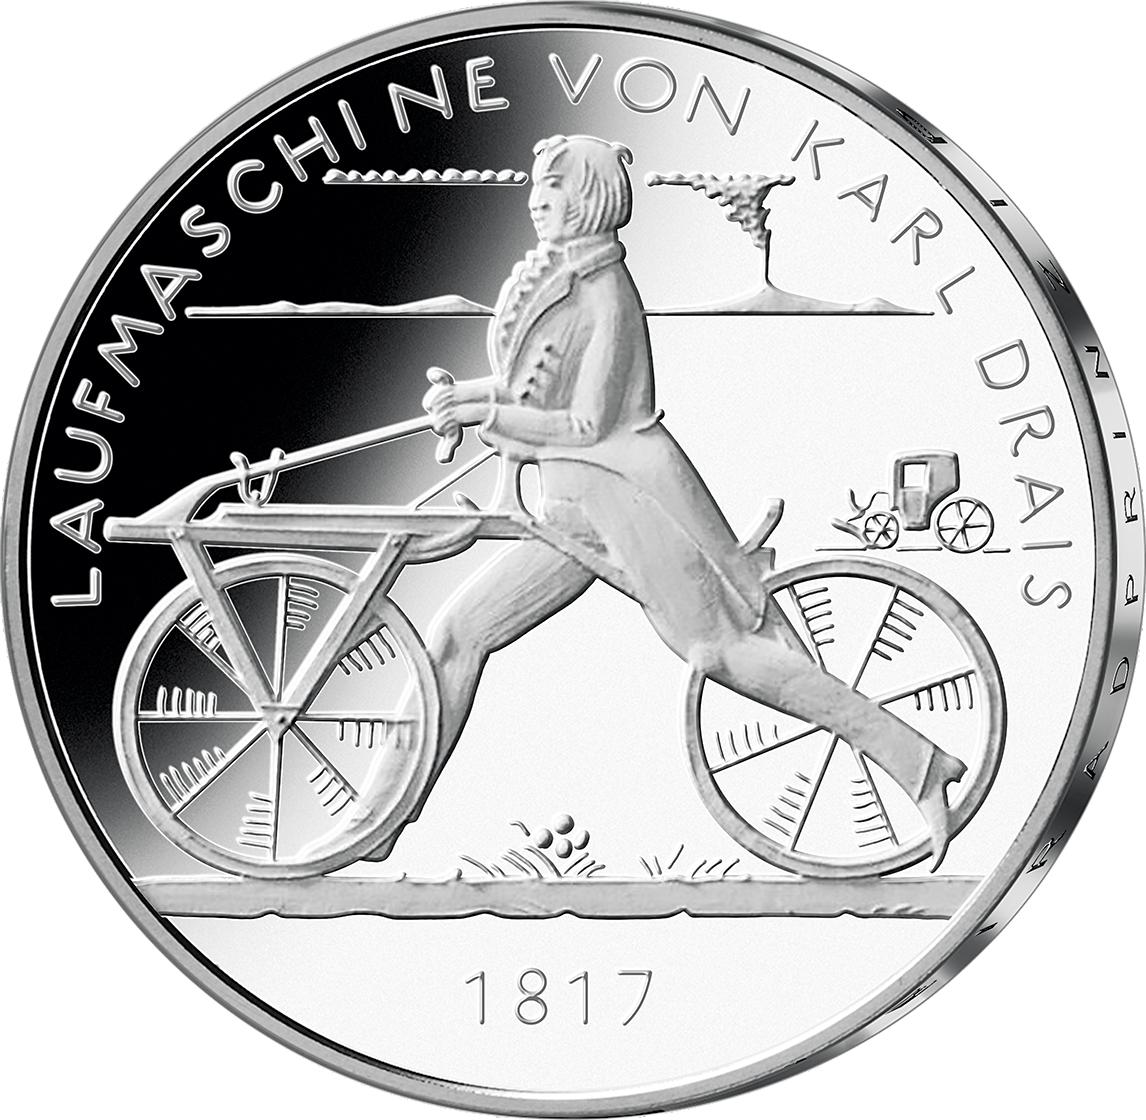 20 Euro Silber Münze Brd 2017 200 J Fahrrad Pp Münzen Günstigerde